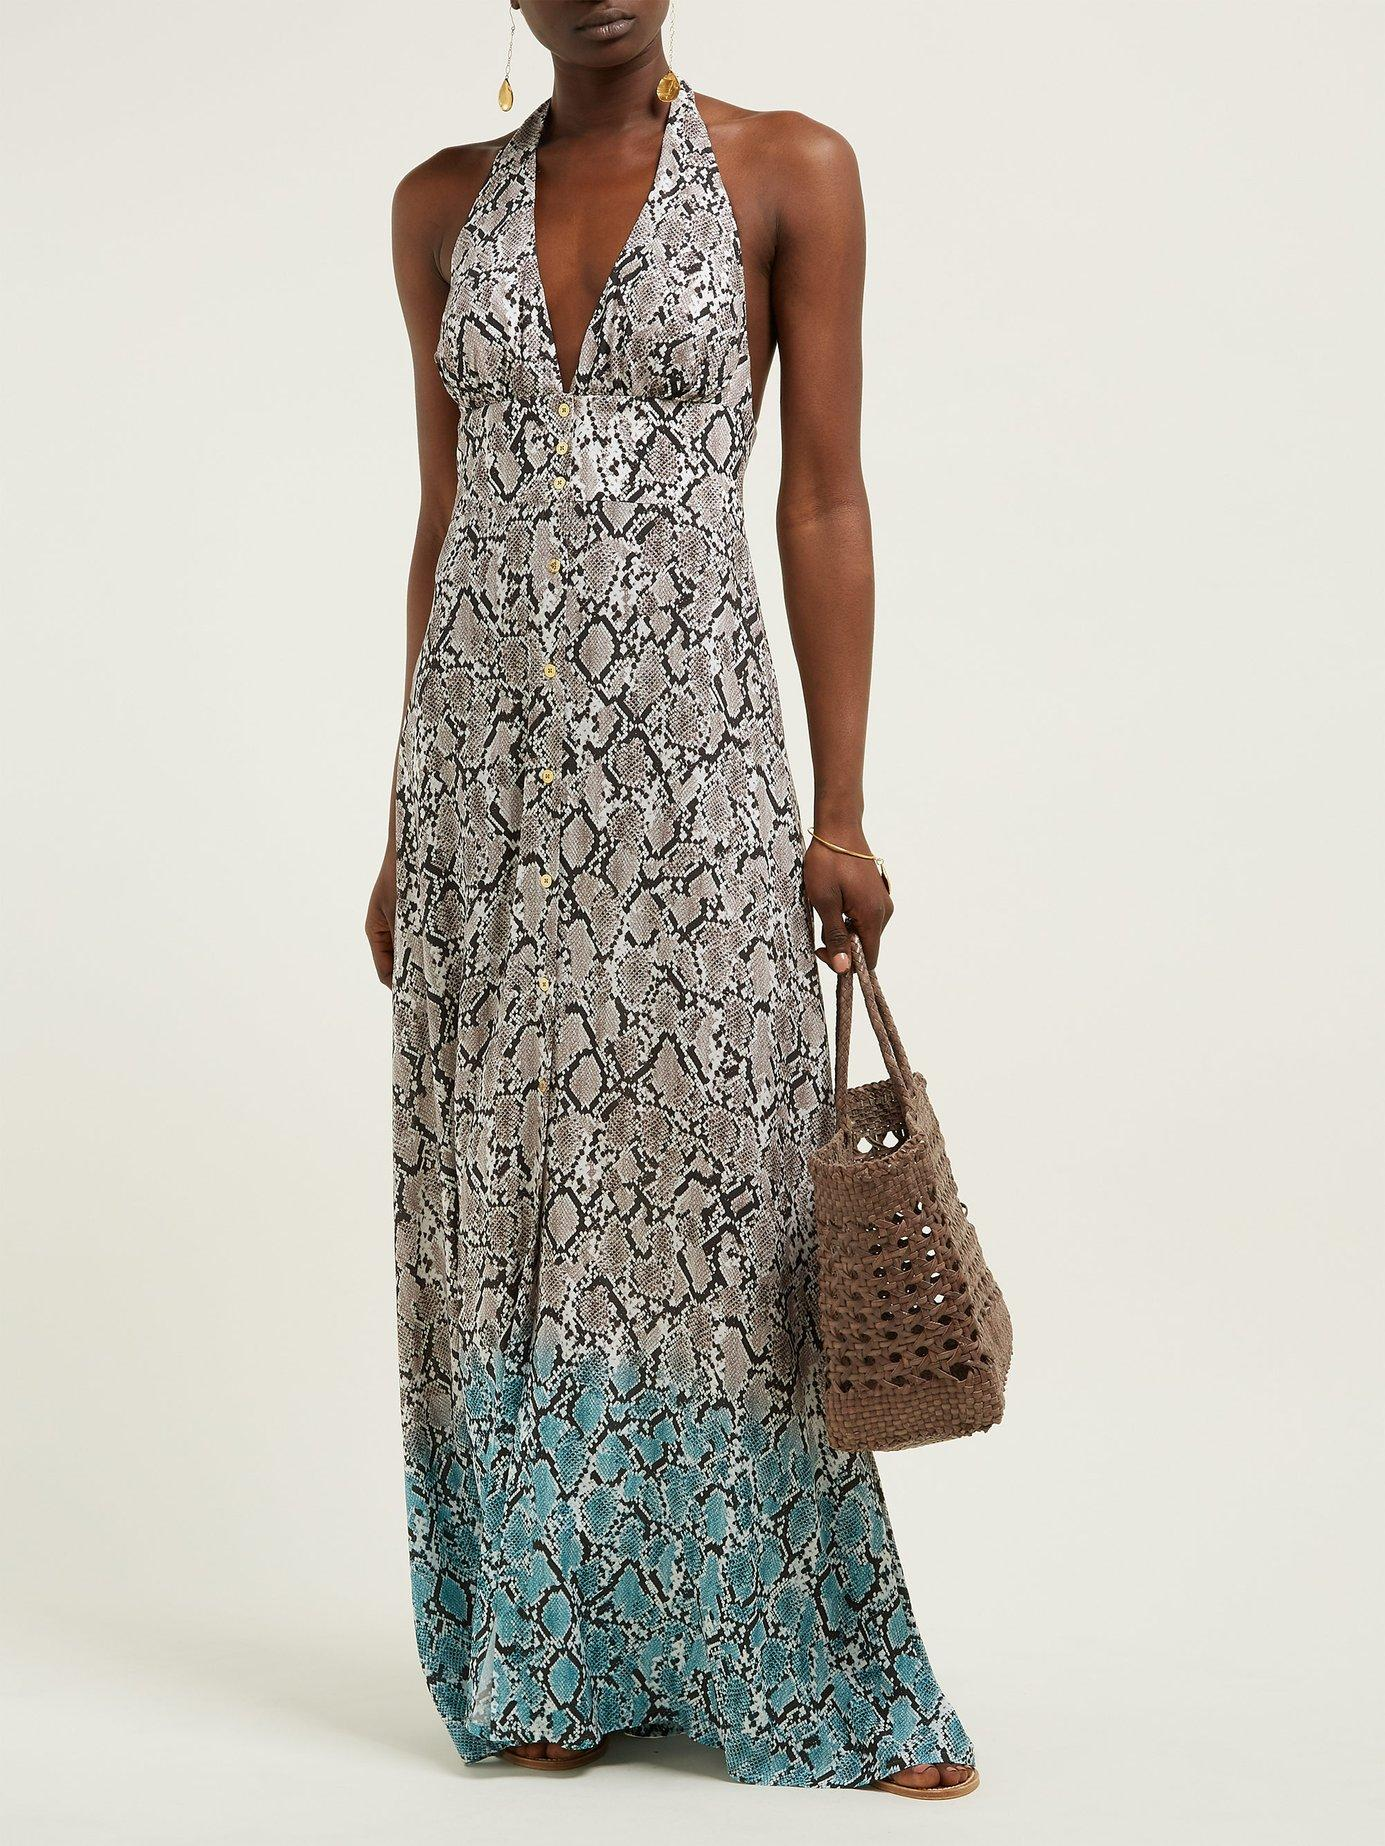 636b2f2d5a Lyst - Heidi Klein Mozambique Snakeskin Print Maxi Dress